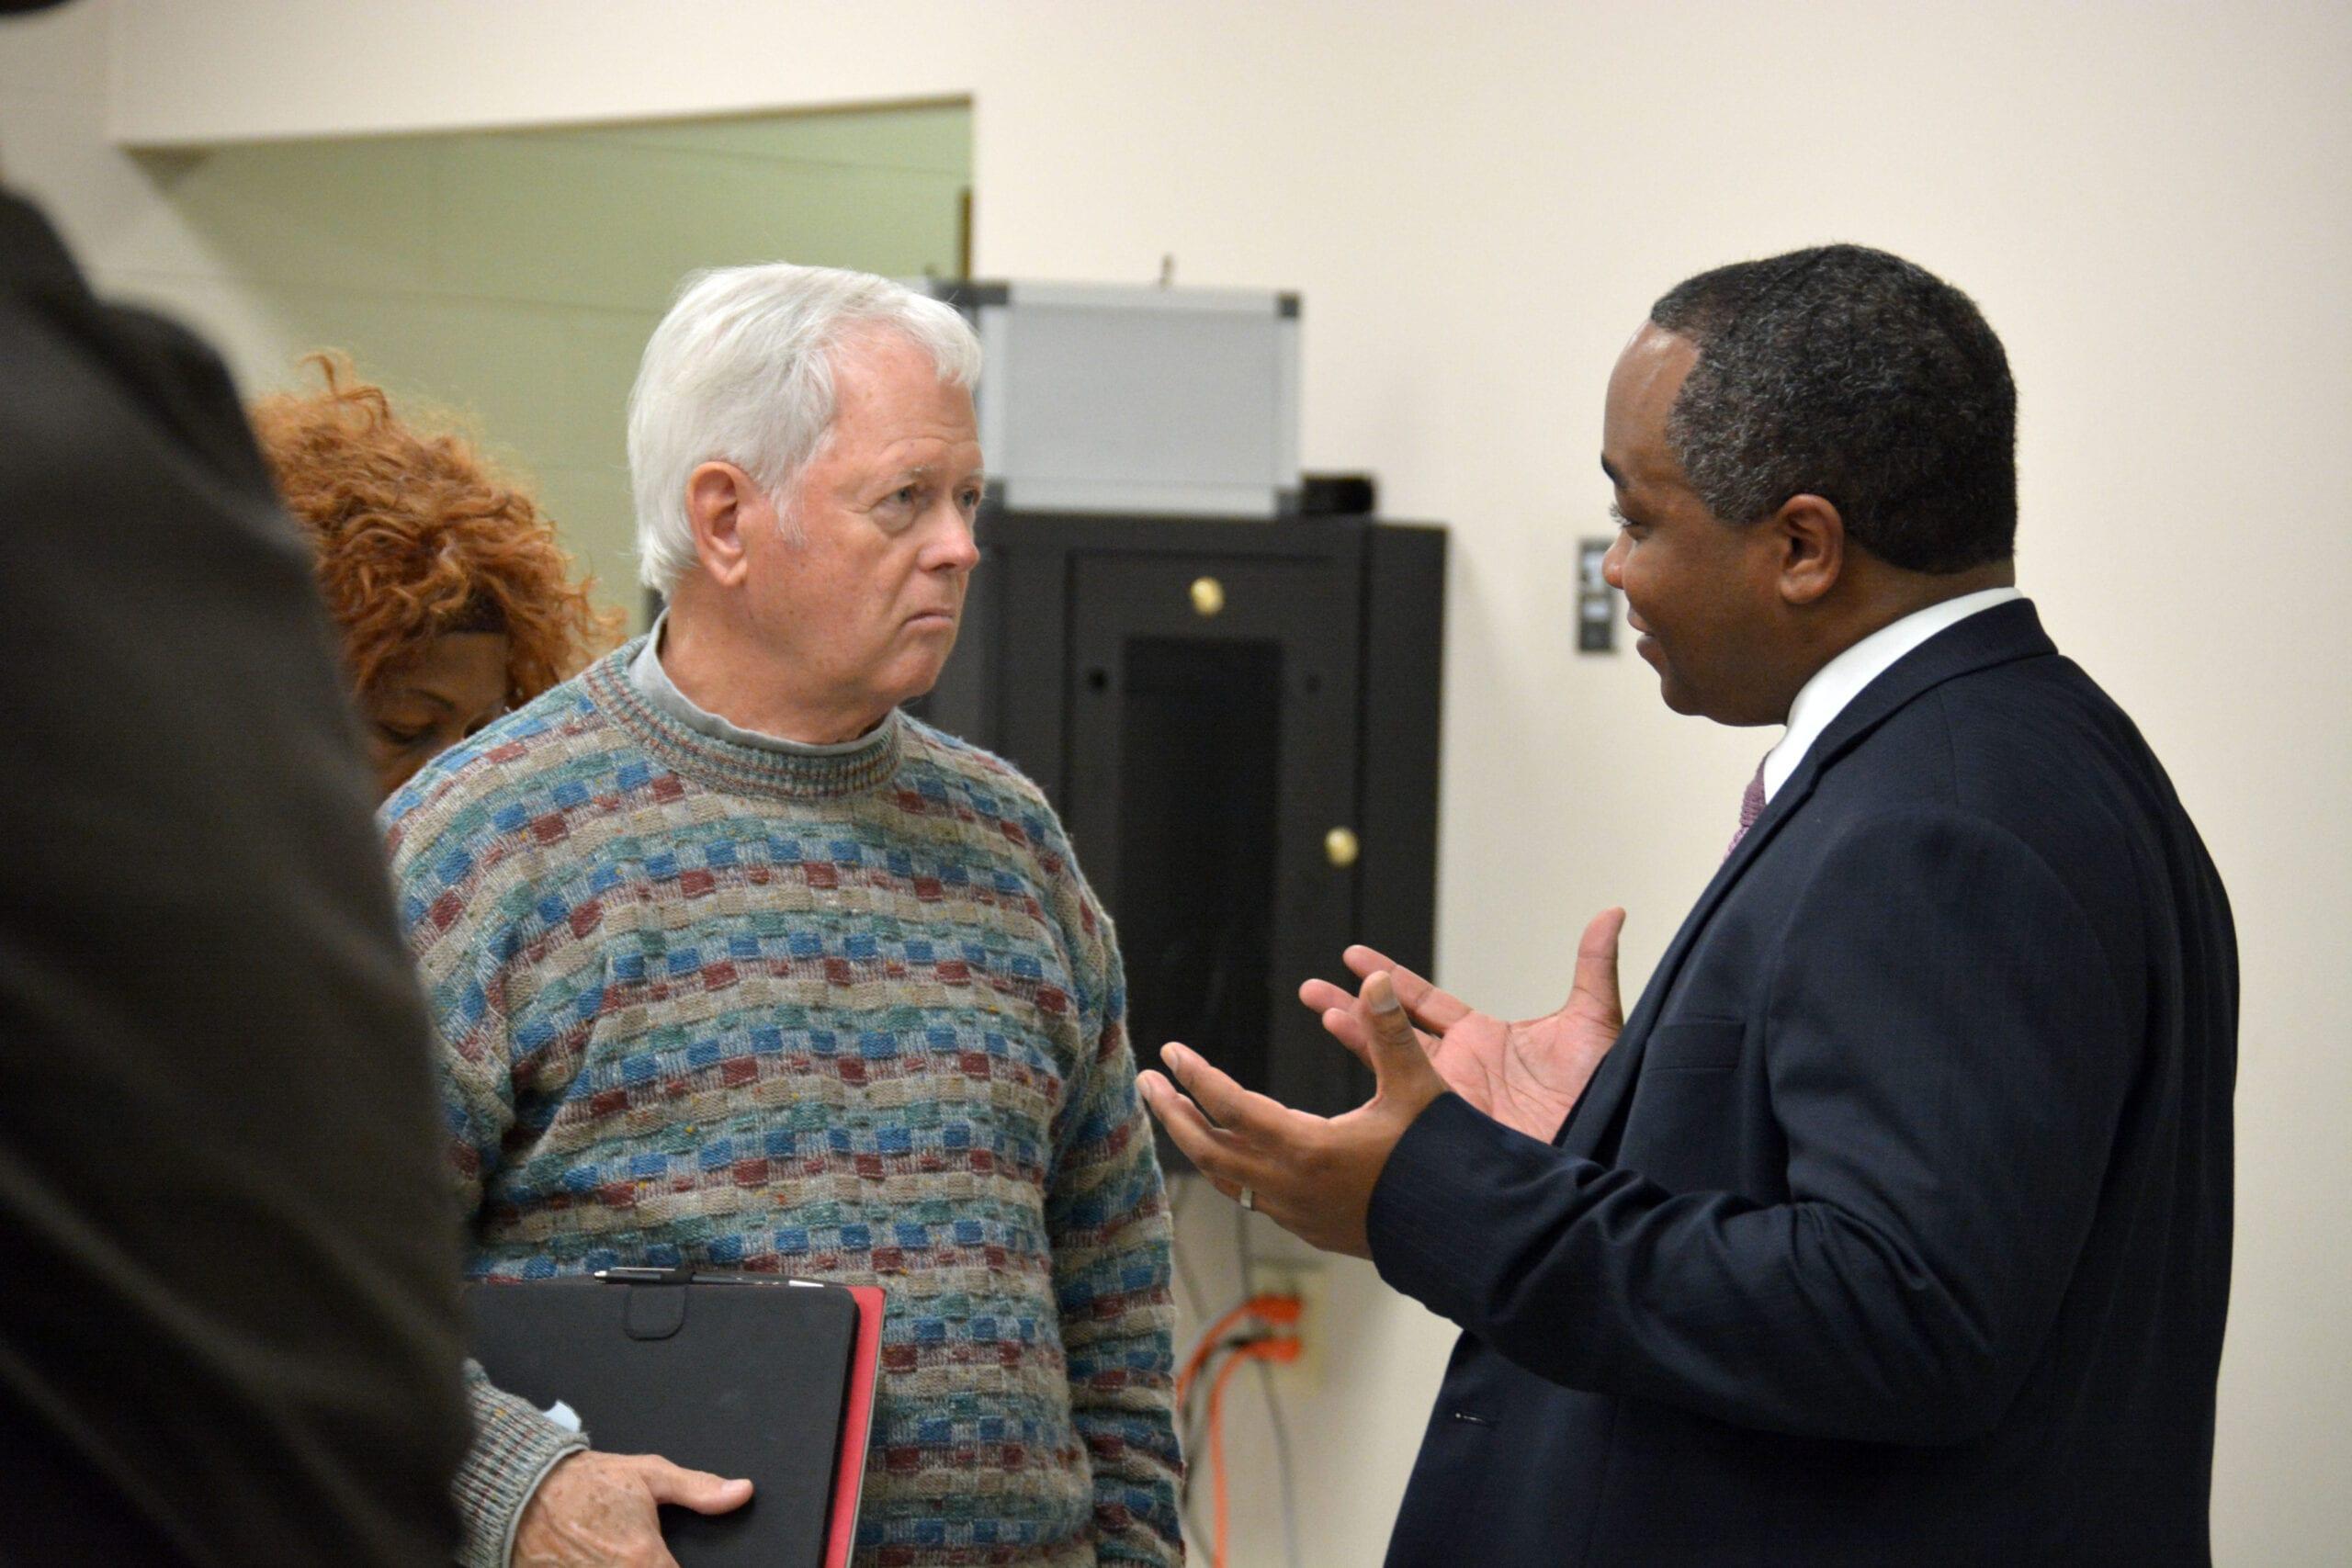 DA Merriweather speaking with a citizen